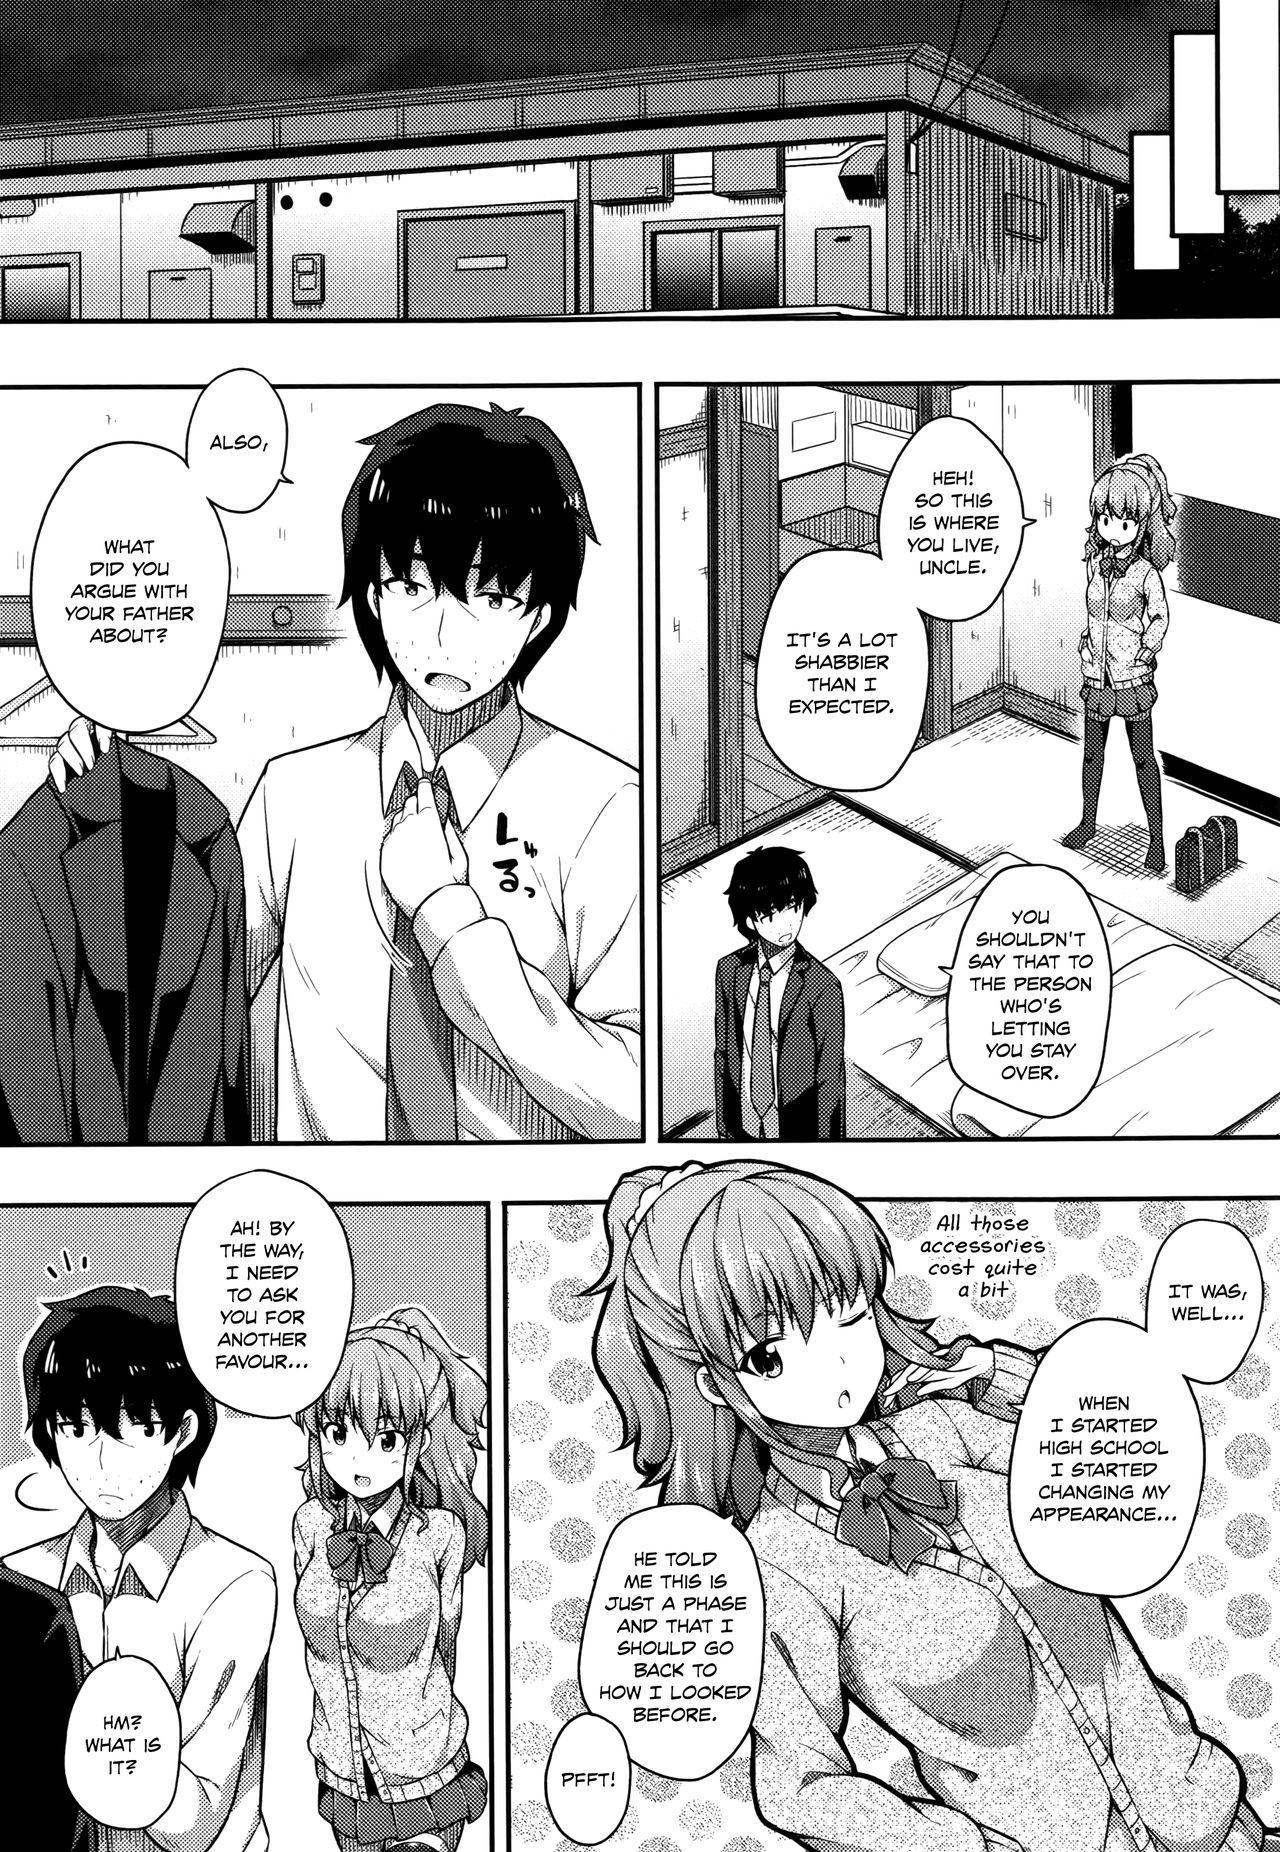 Kimi ga Haramu made Nando mo Aishiteru | I'll love you many times until you get pregnant 78